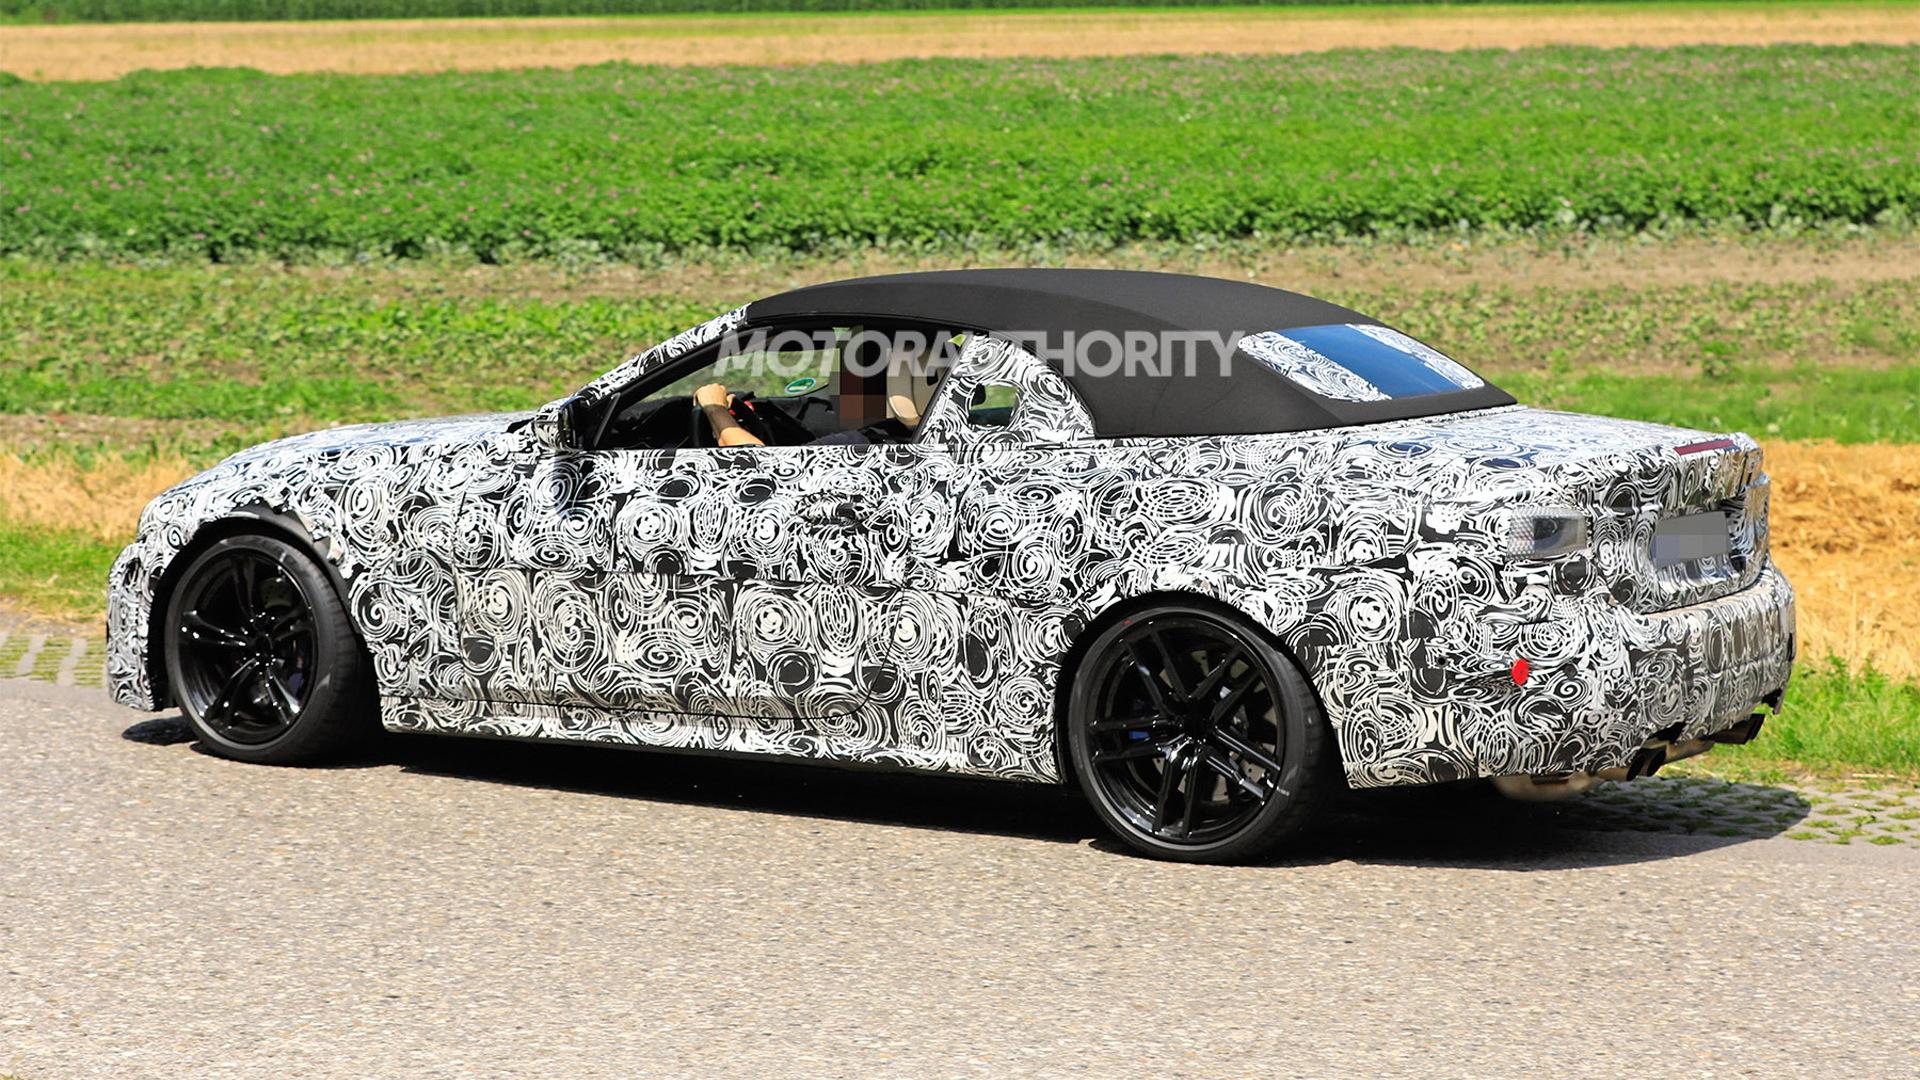 2021 BMW M4 Convertible spy shots - Photo credit: S. Baldauf/SB-Medien